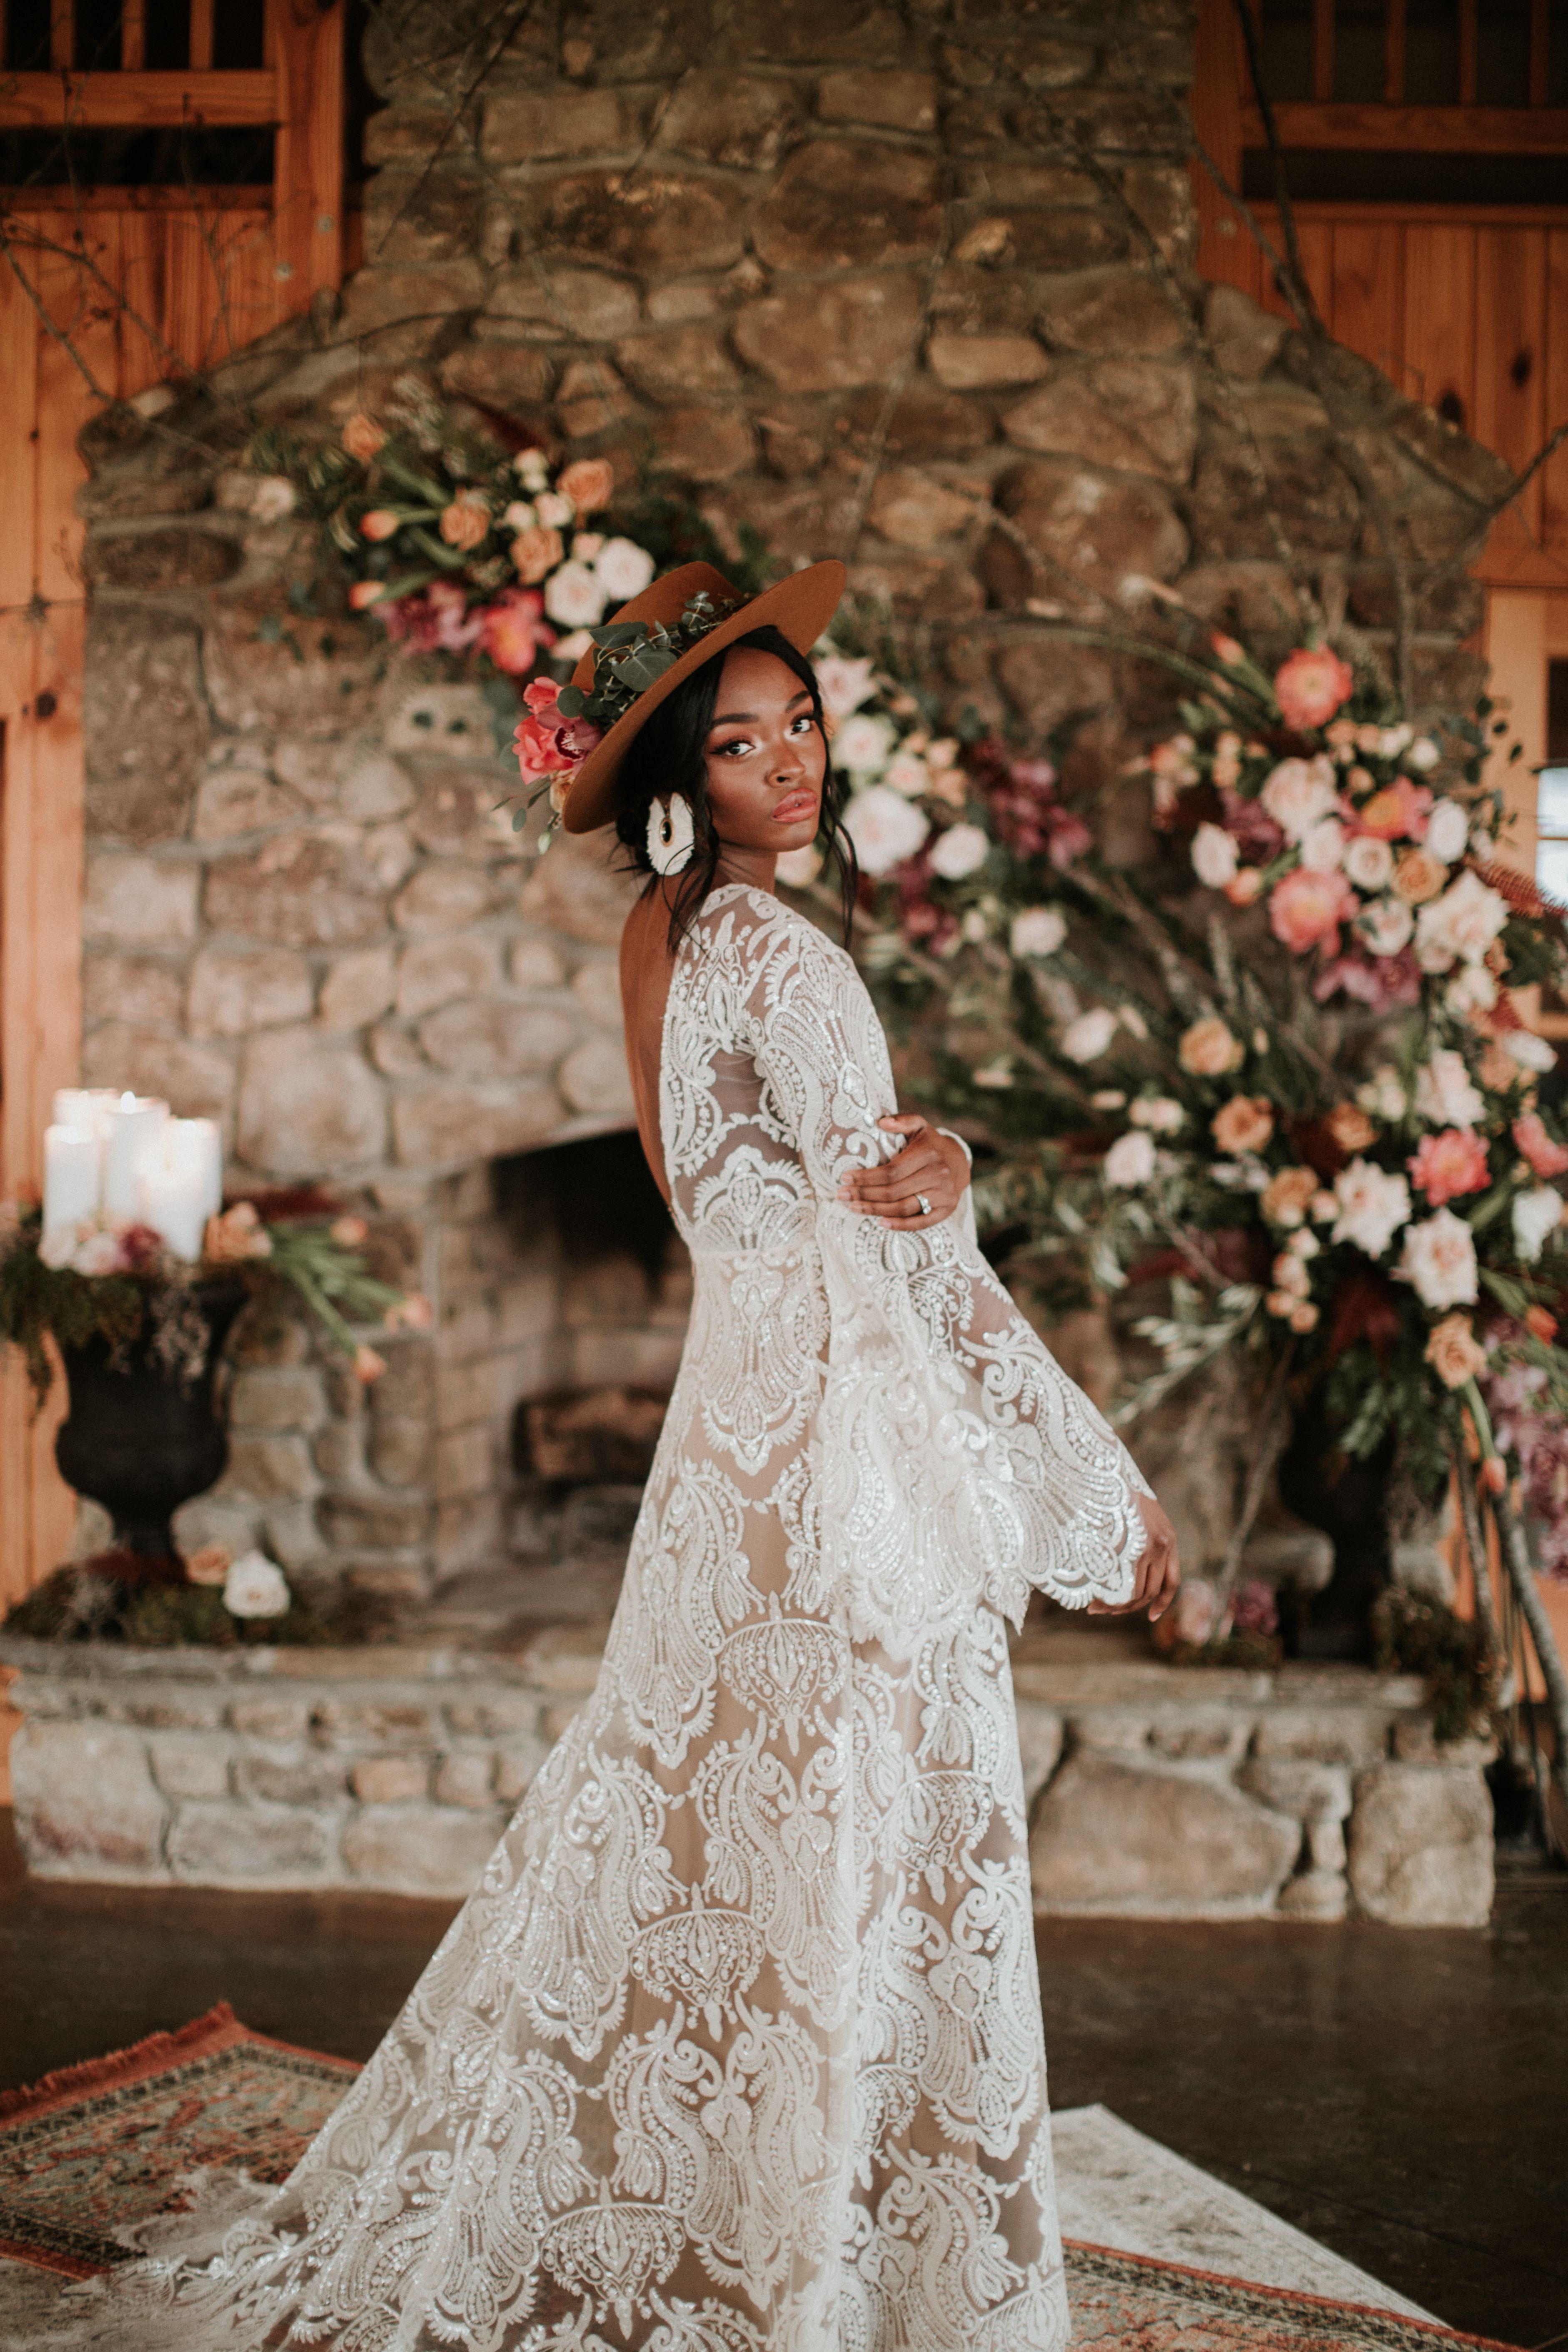 Pin On Boho Hair,Mermaid Lace Corset Wedding Dress